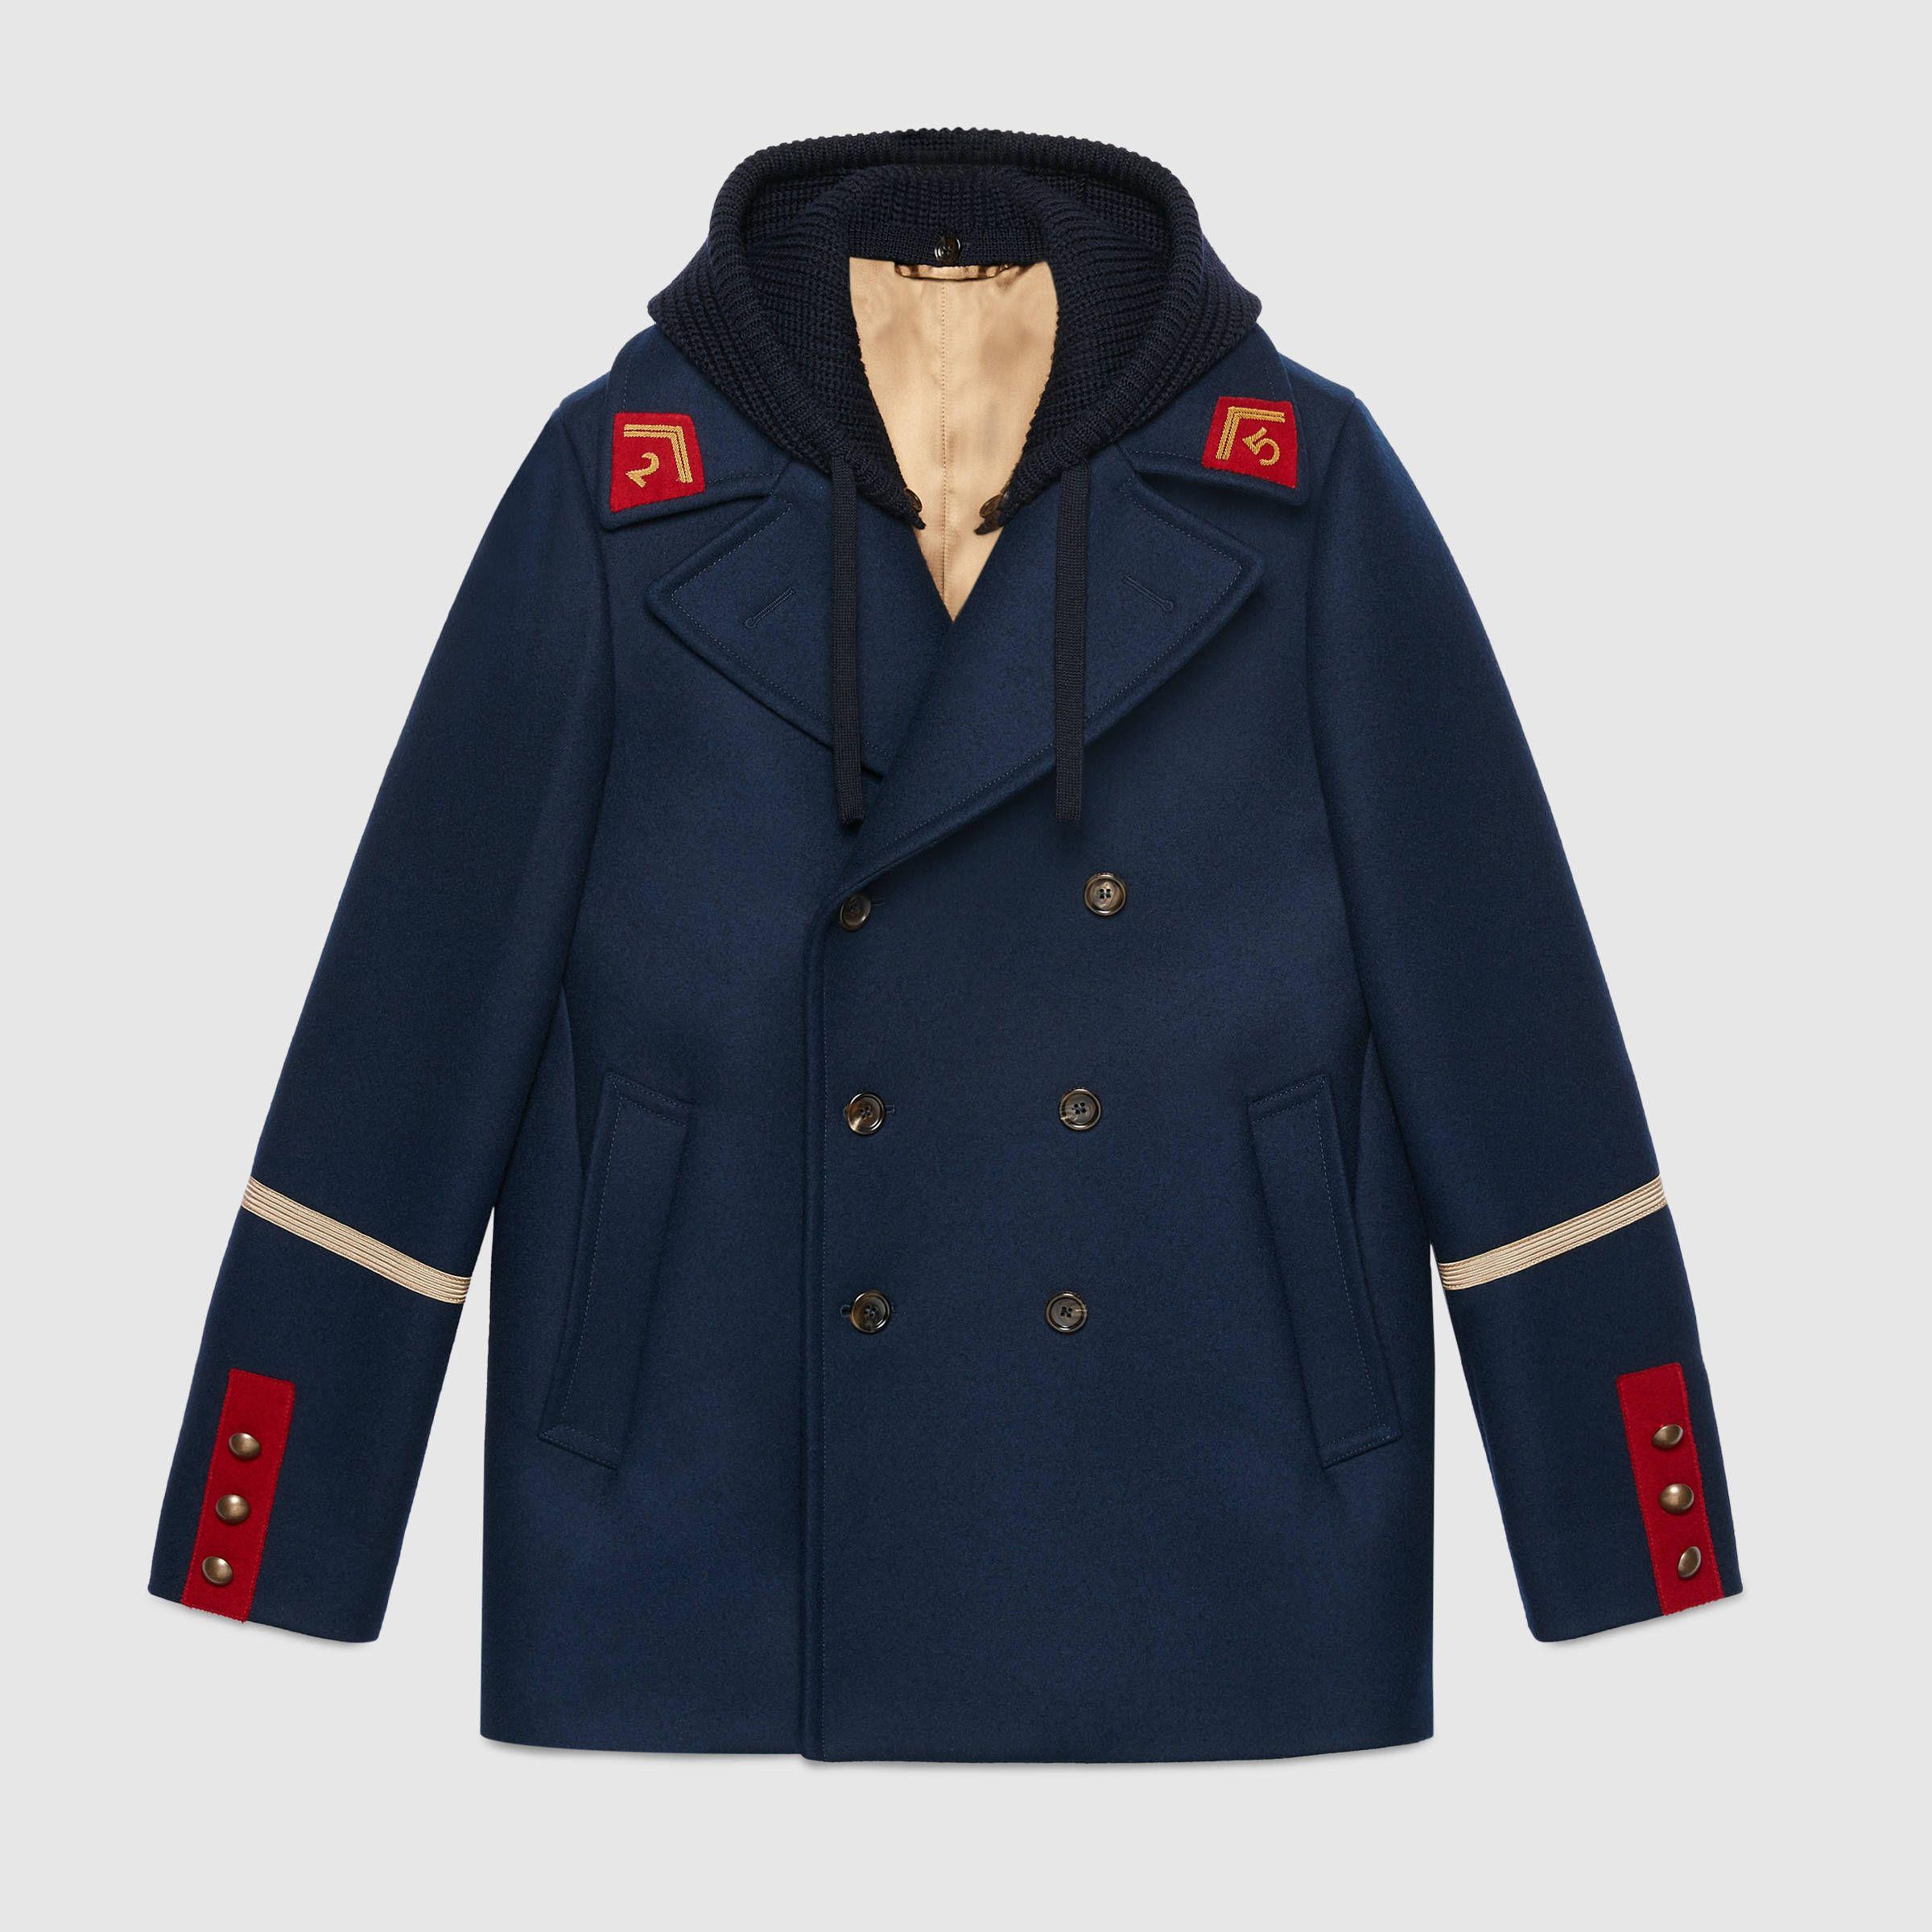 886874d25a Embroidered felt coat - Gucci Jackets & Coats 494794Z531H4618 | AW19 ...